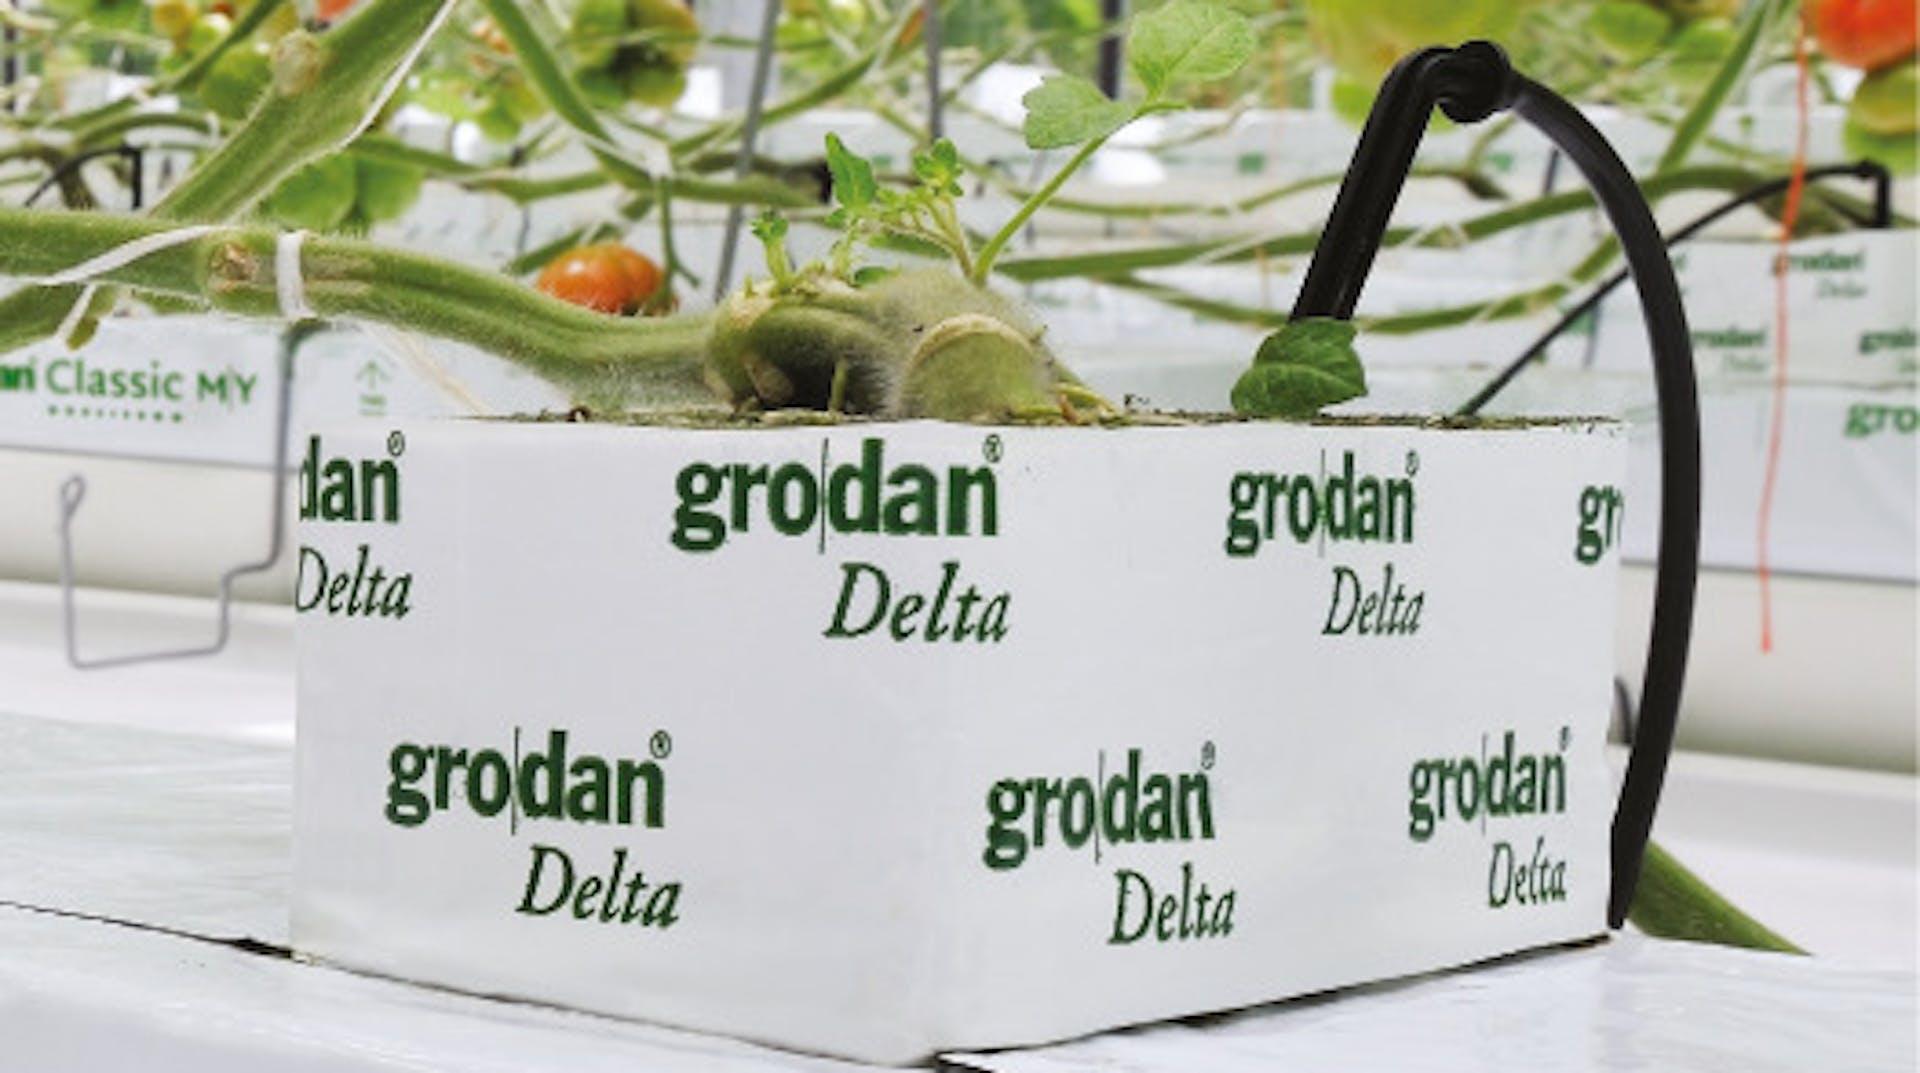 Growing solutions, growth, quality, innovative, development, Tomato plant, grown, Grodan Delta block, greenhouse